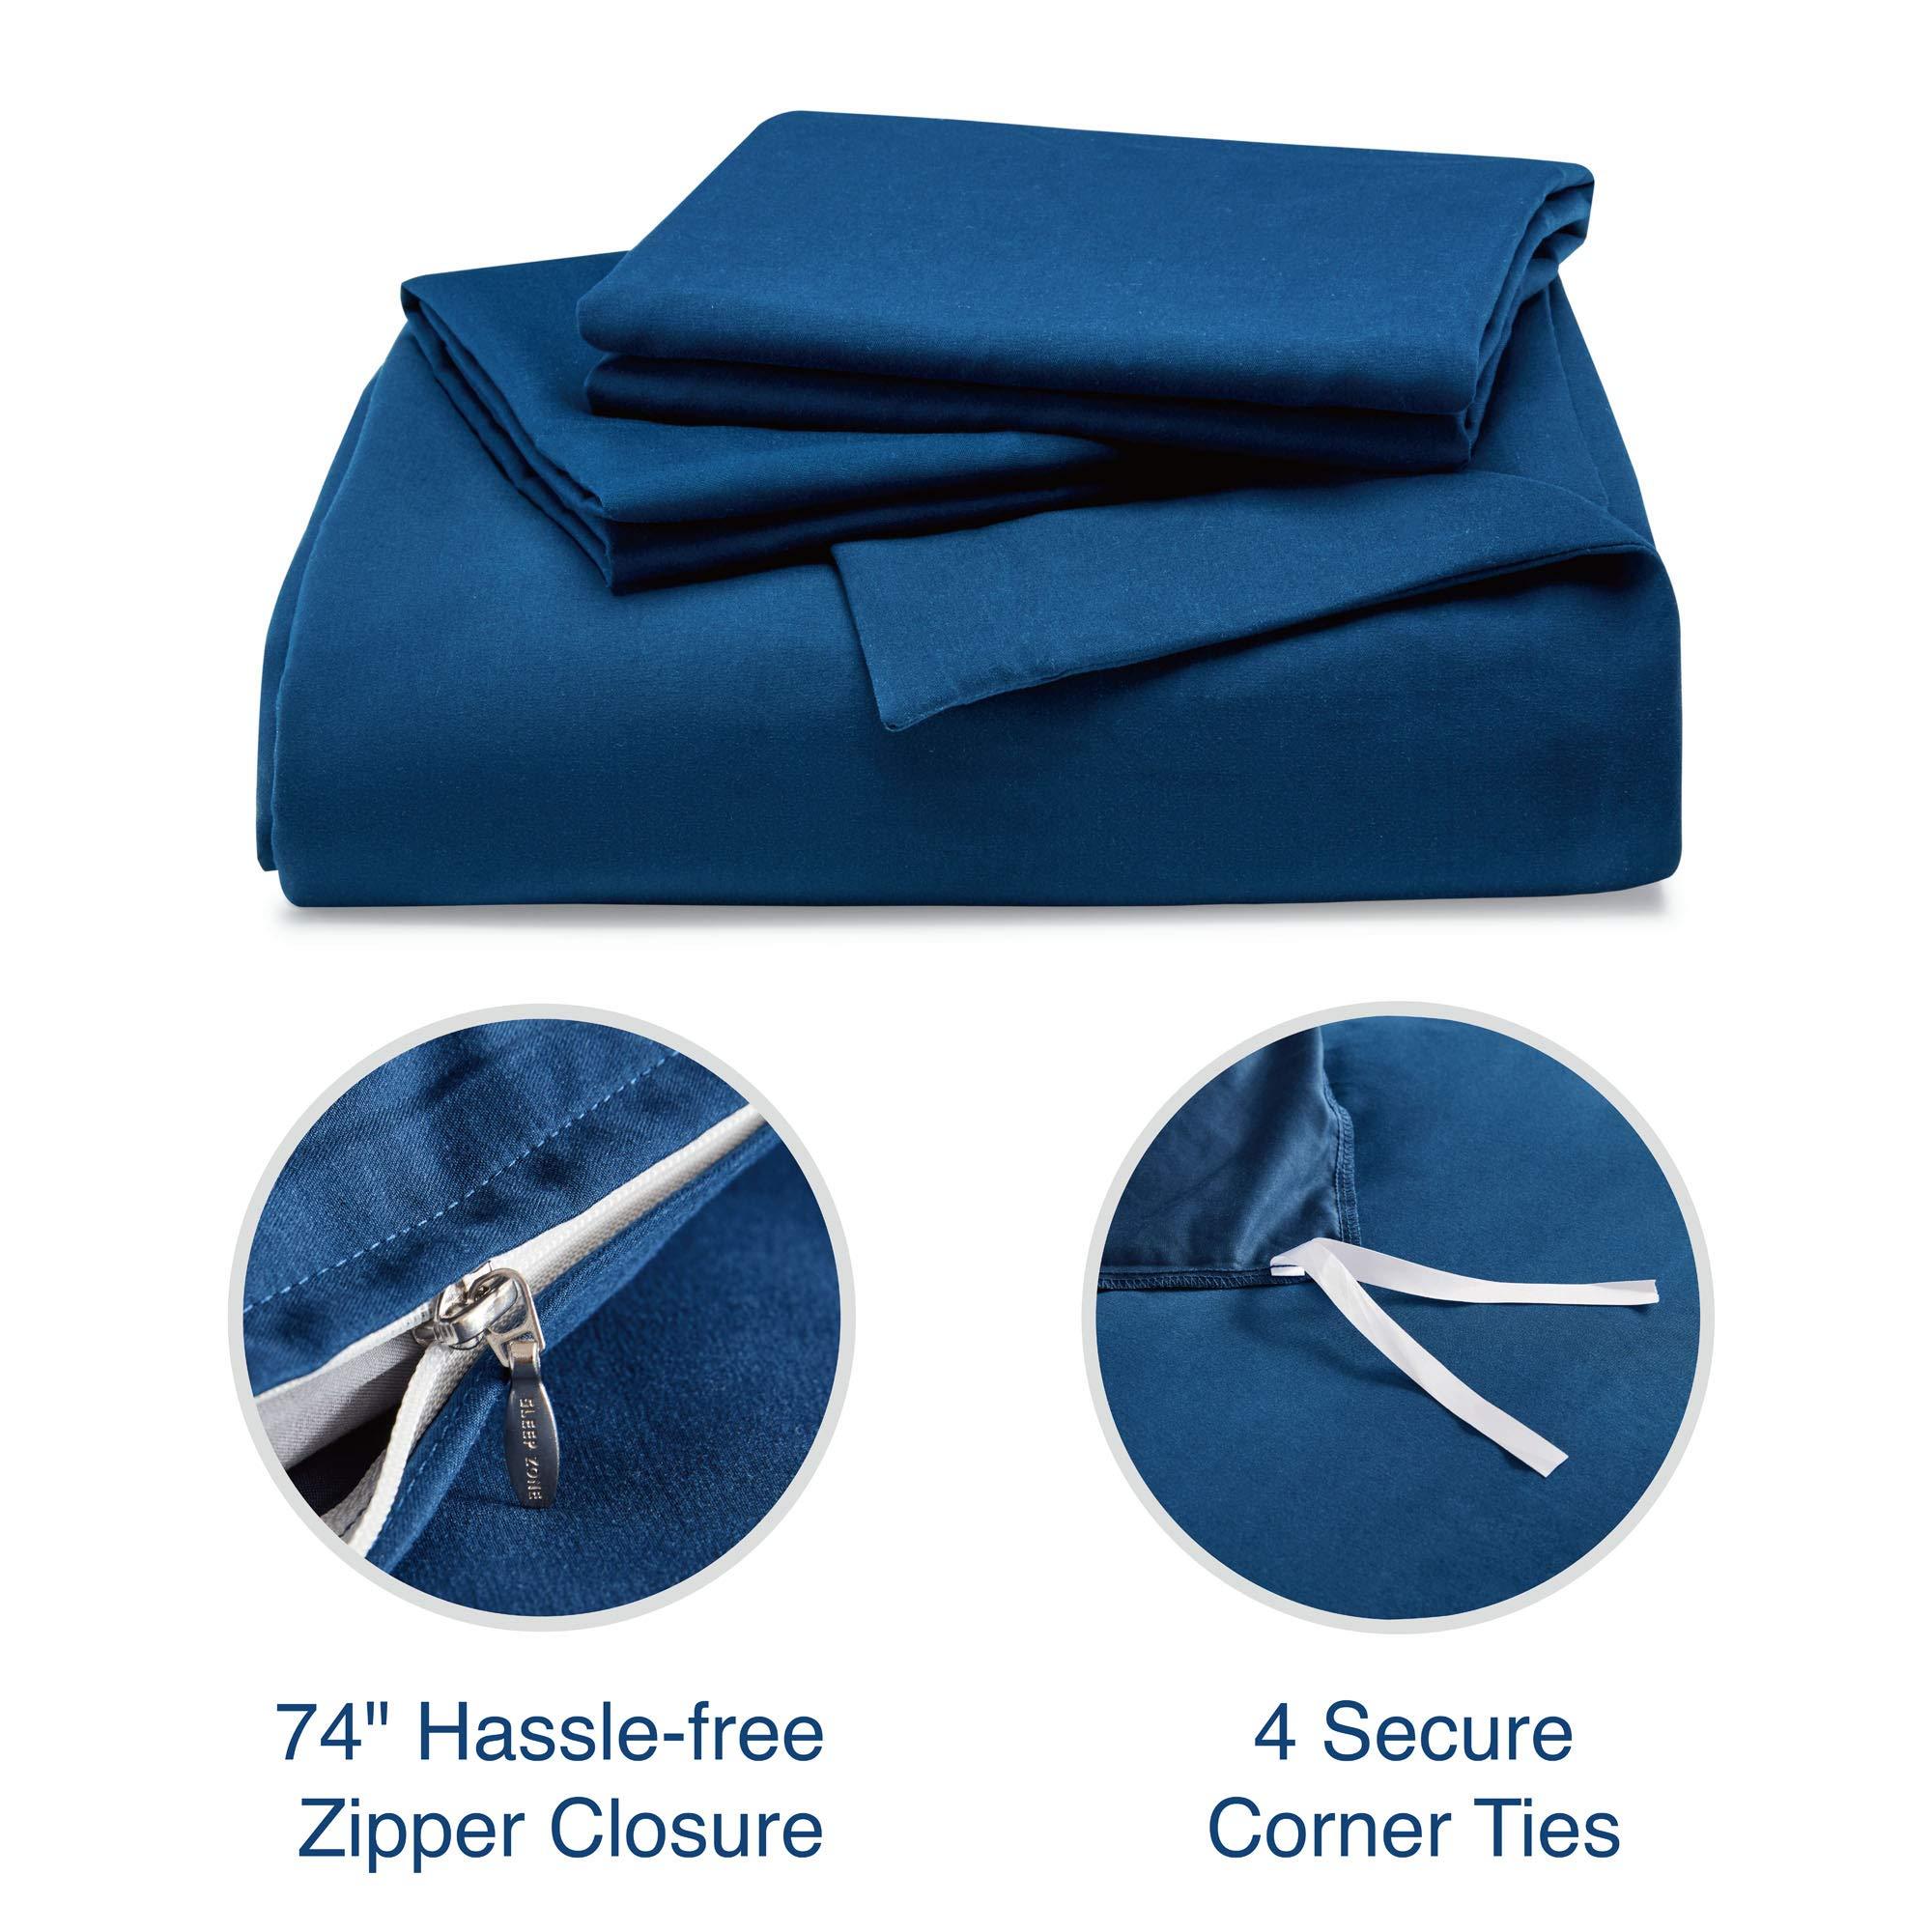 SLEEP ZONE Bedding Duvet Cover Cooling 120gsm Soft Zipper Closure 3 PC, Navy Blue,Full/Queen